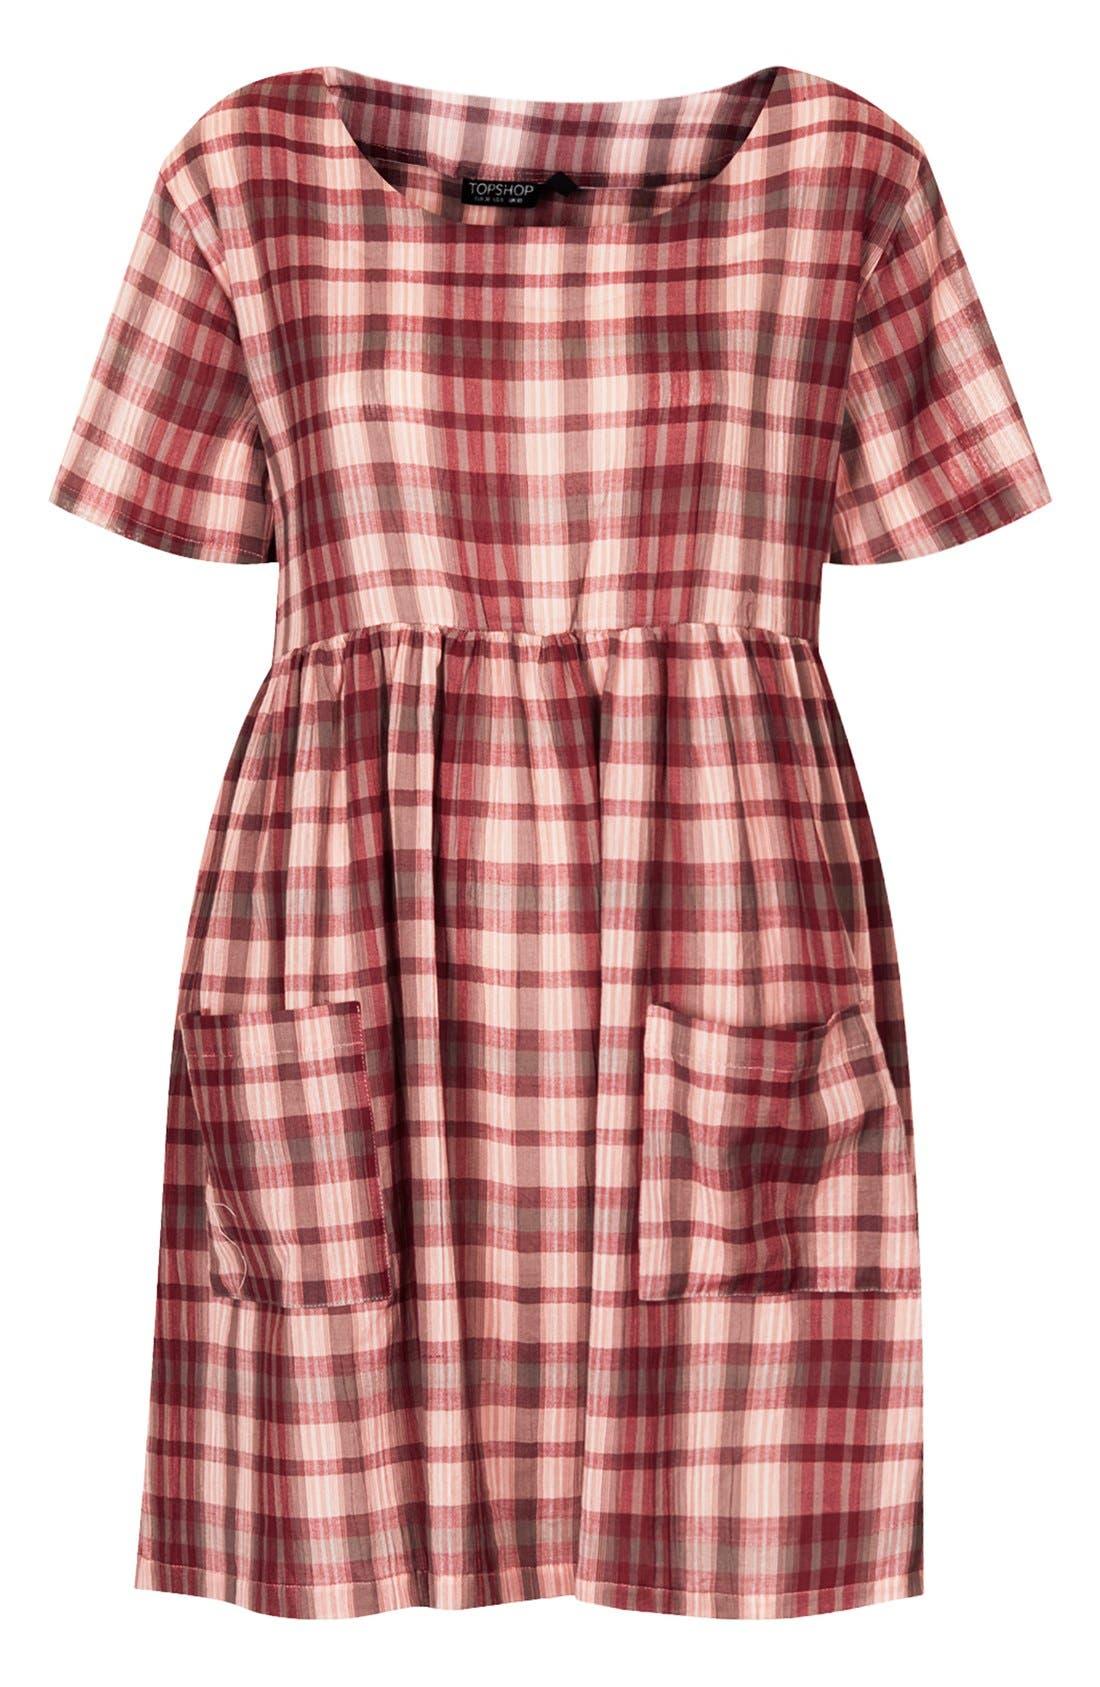 Alternate Image 3  - Topshop Plaid Cotton Smock Dress